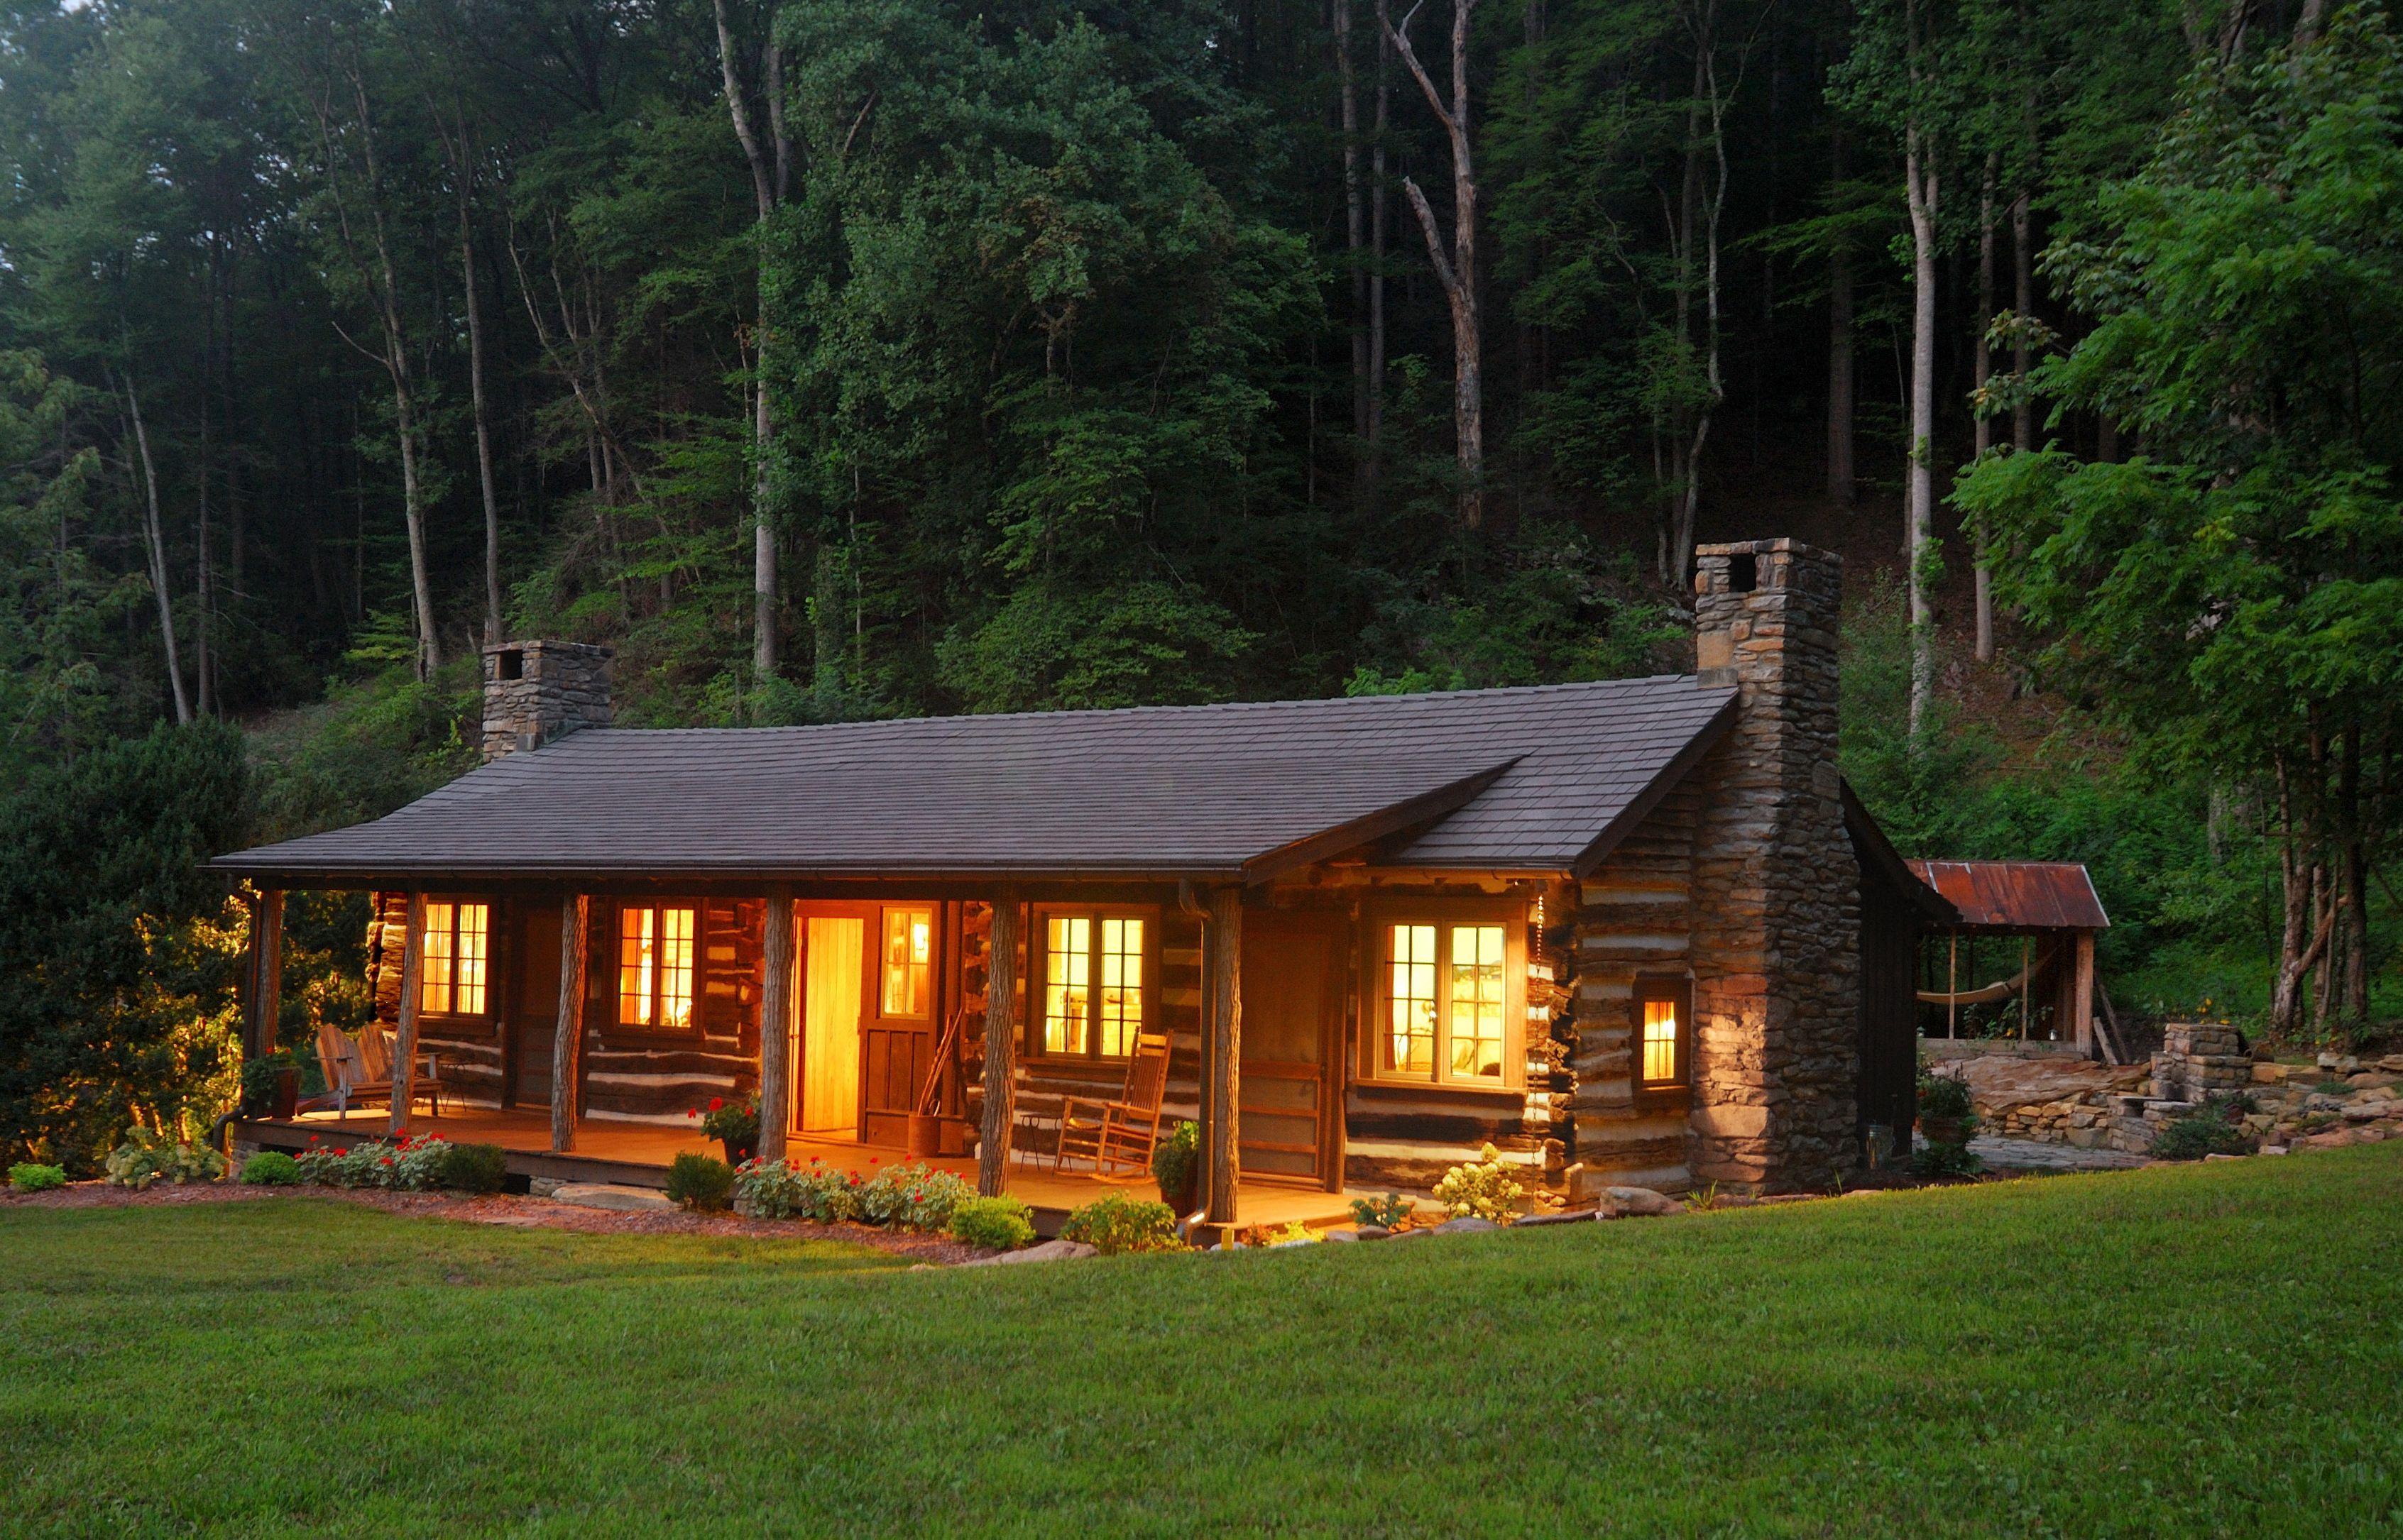 jasons cabin locations - HD3385×2170